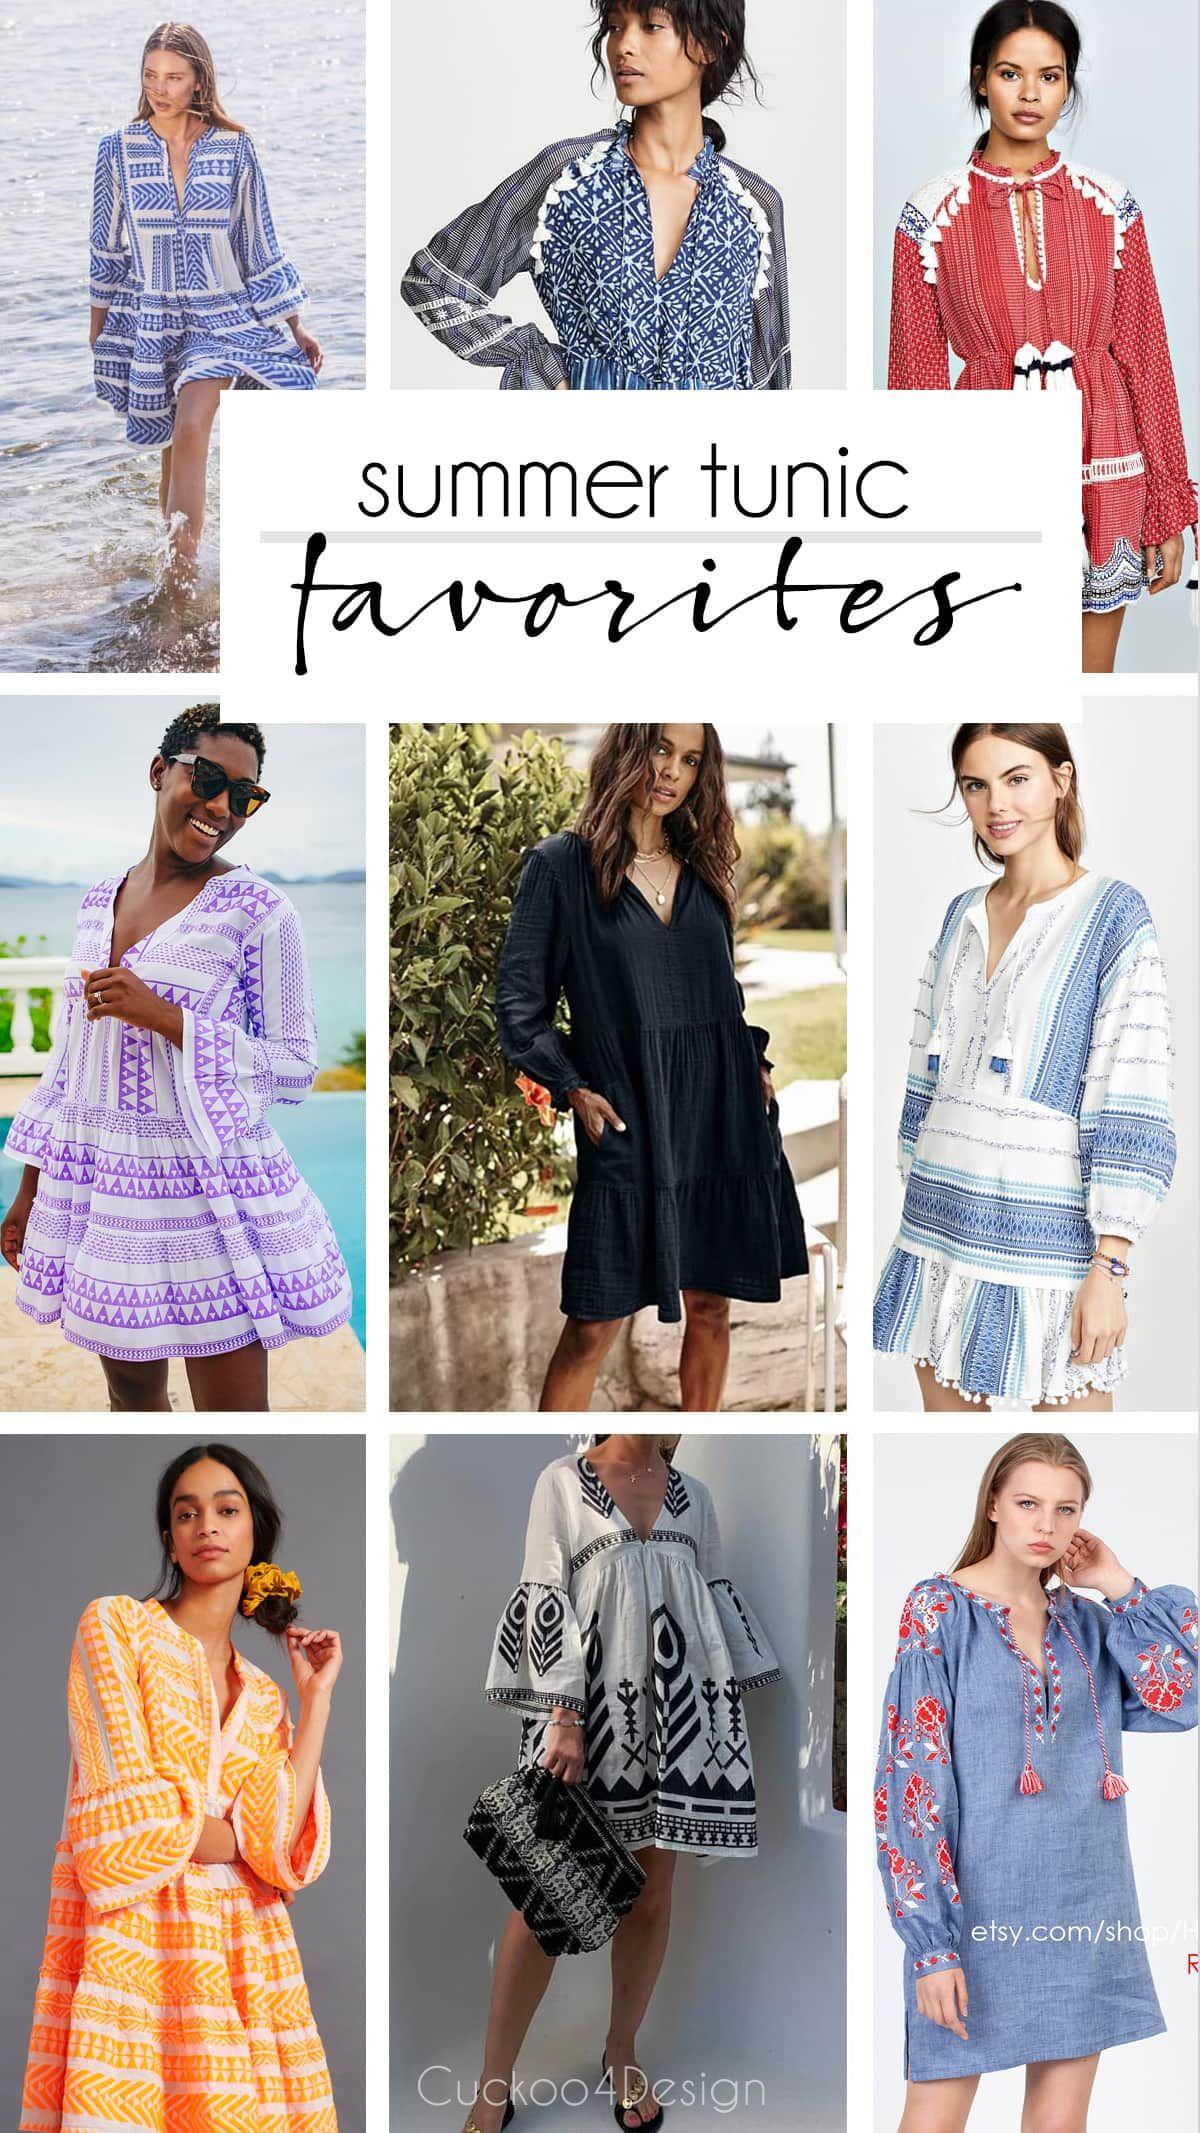 My Favorite Tunic Dresses In 2021 Summer Tunics Stylish Summer Outfits Summer Tunic Dress [ 2133 x 1200 Pixel ]